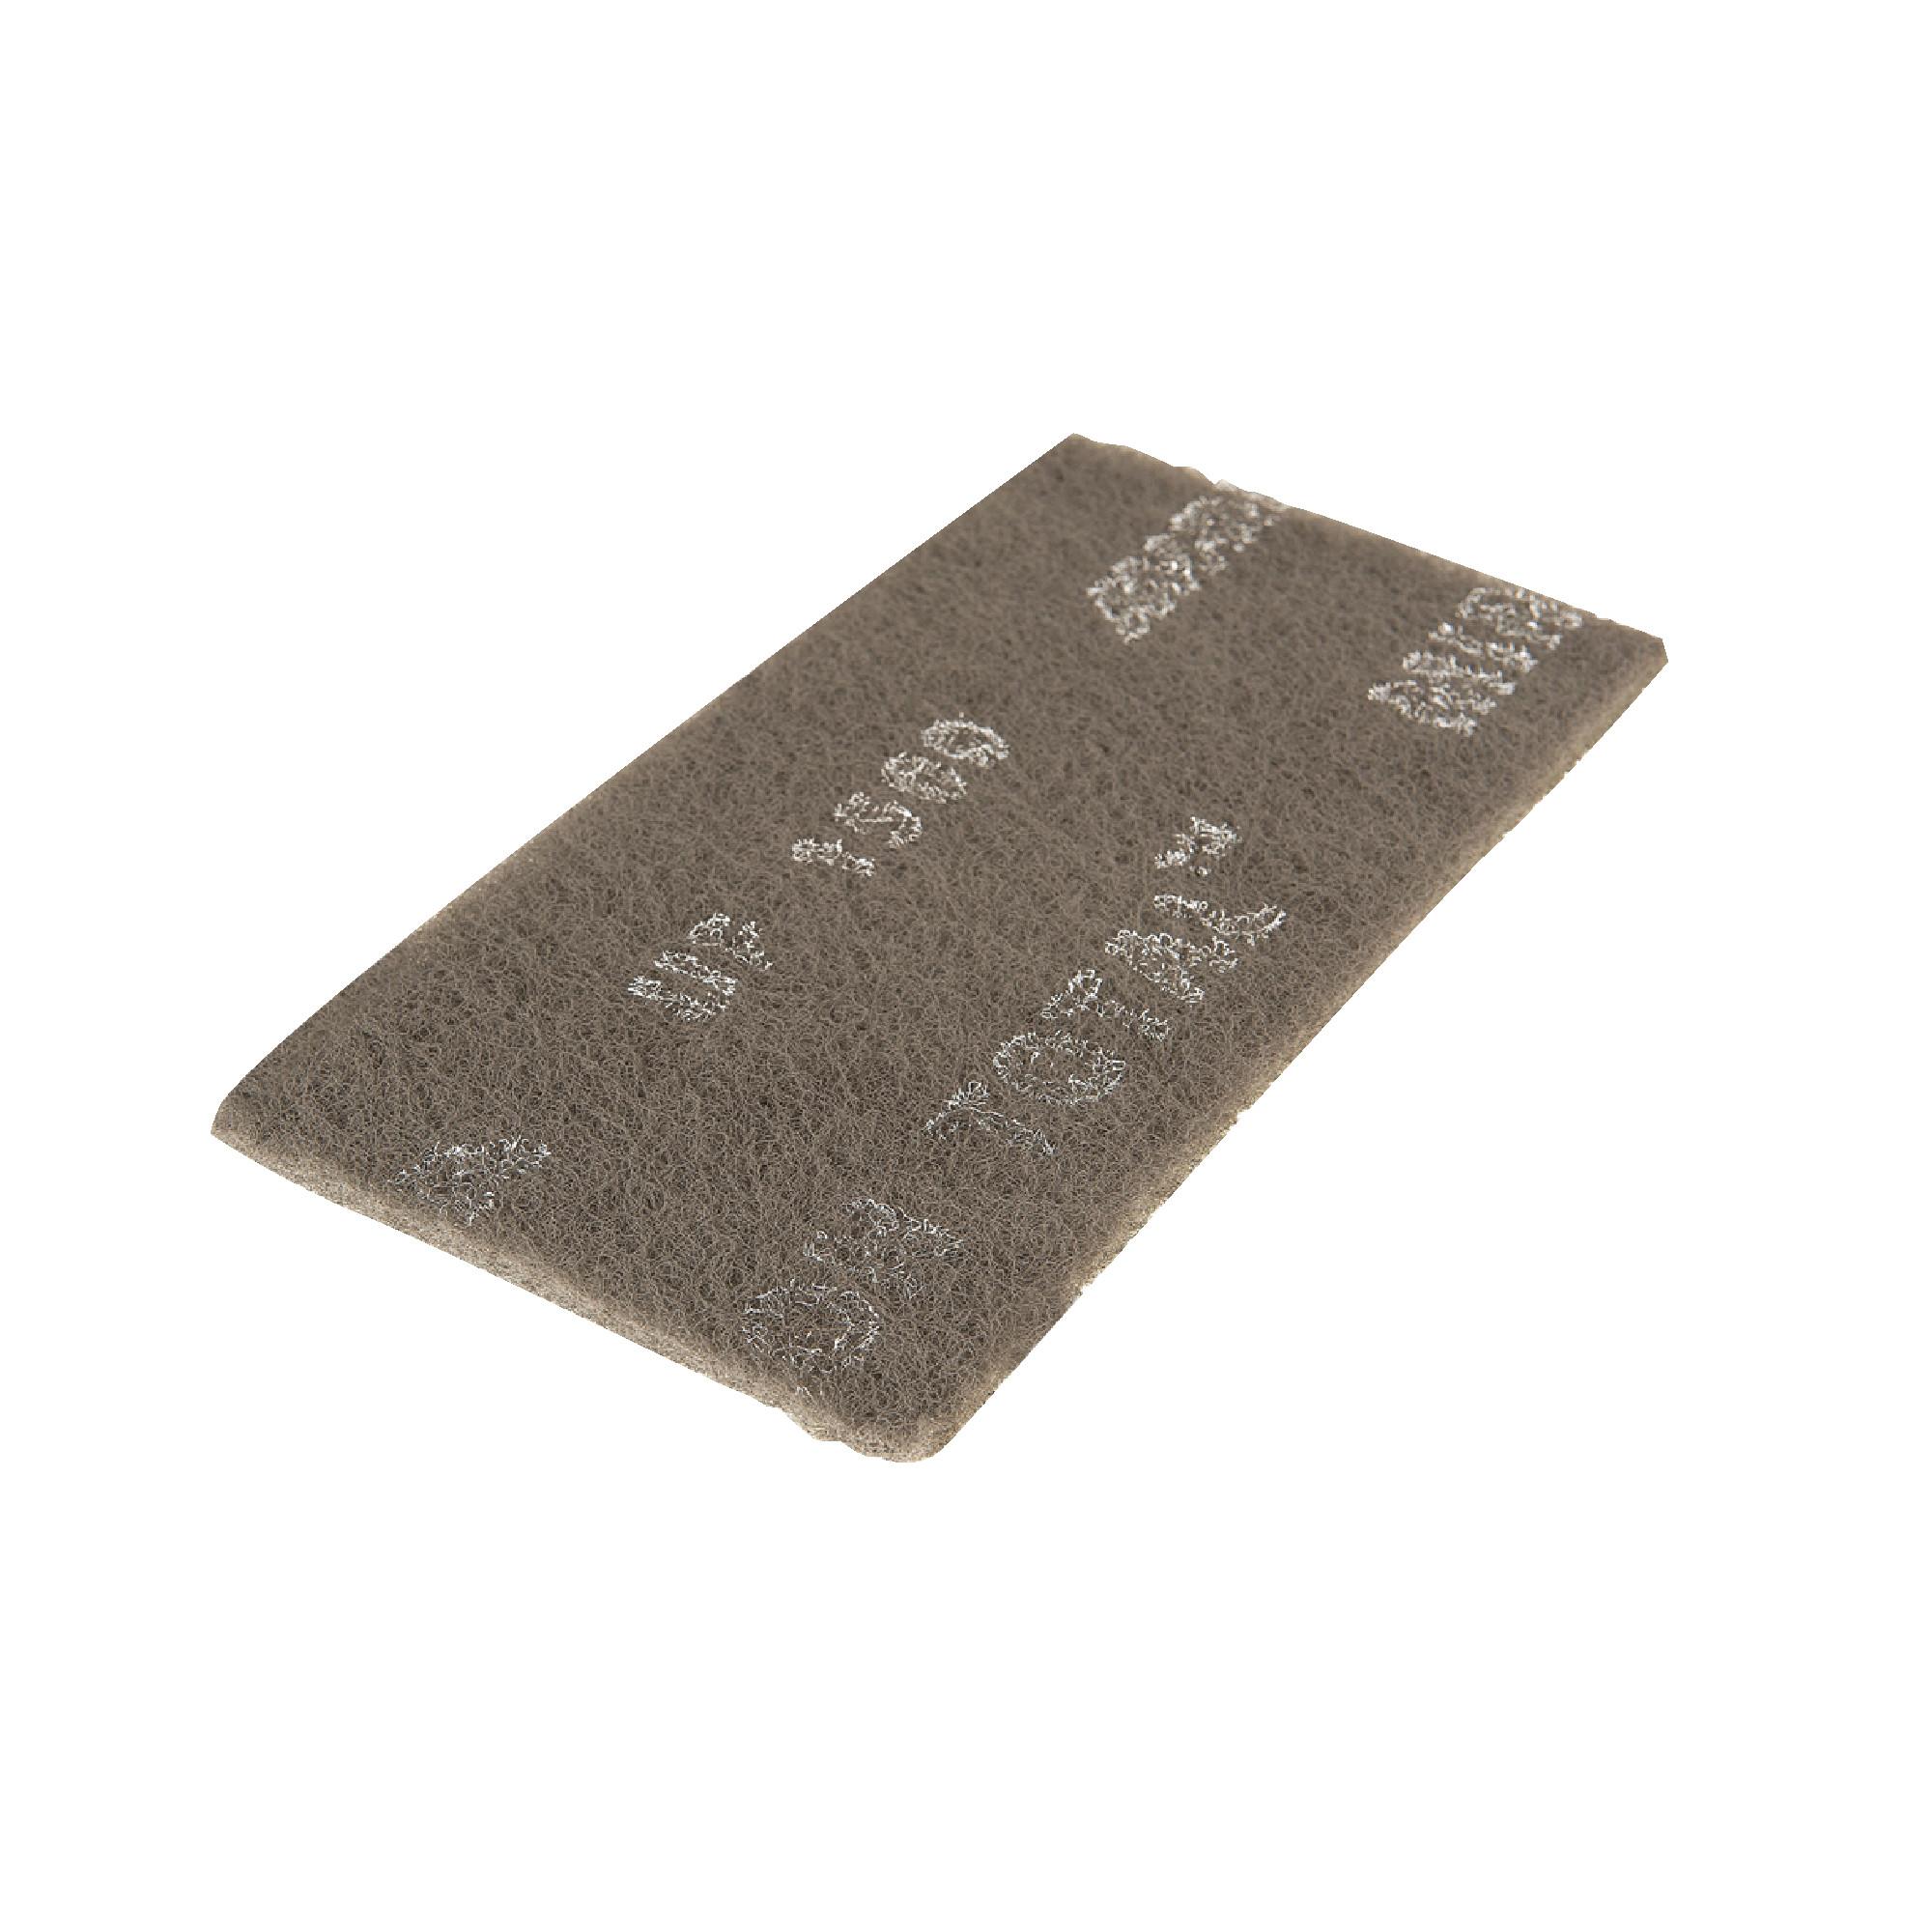 4.5X9 MIRKA MIRLON TOTAL HAND PADS GRAY 25;PIECE